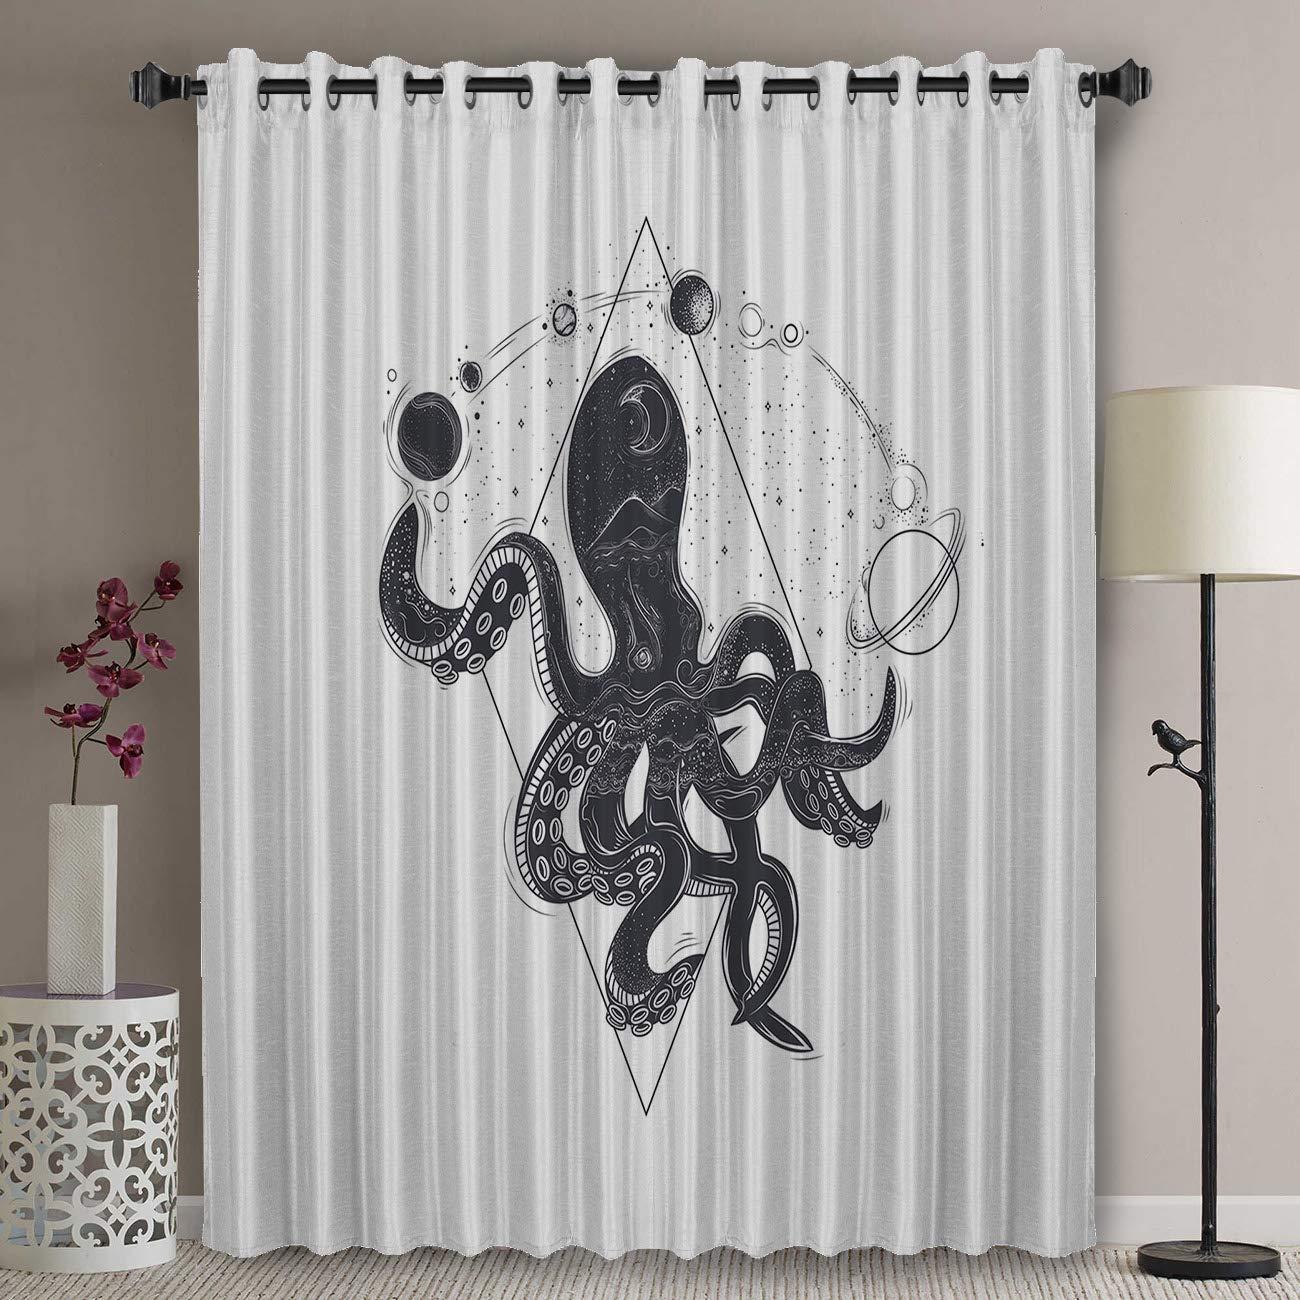 Amplio Panel de cortina de puerta de Patio de oscurecimiento térmico-24 pulgadas de largo ojal superior aislamiento térmico dormitorio oscurecimiento cortina-Negro